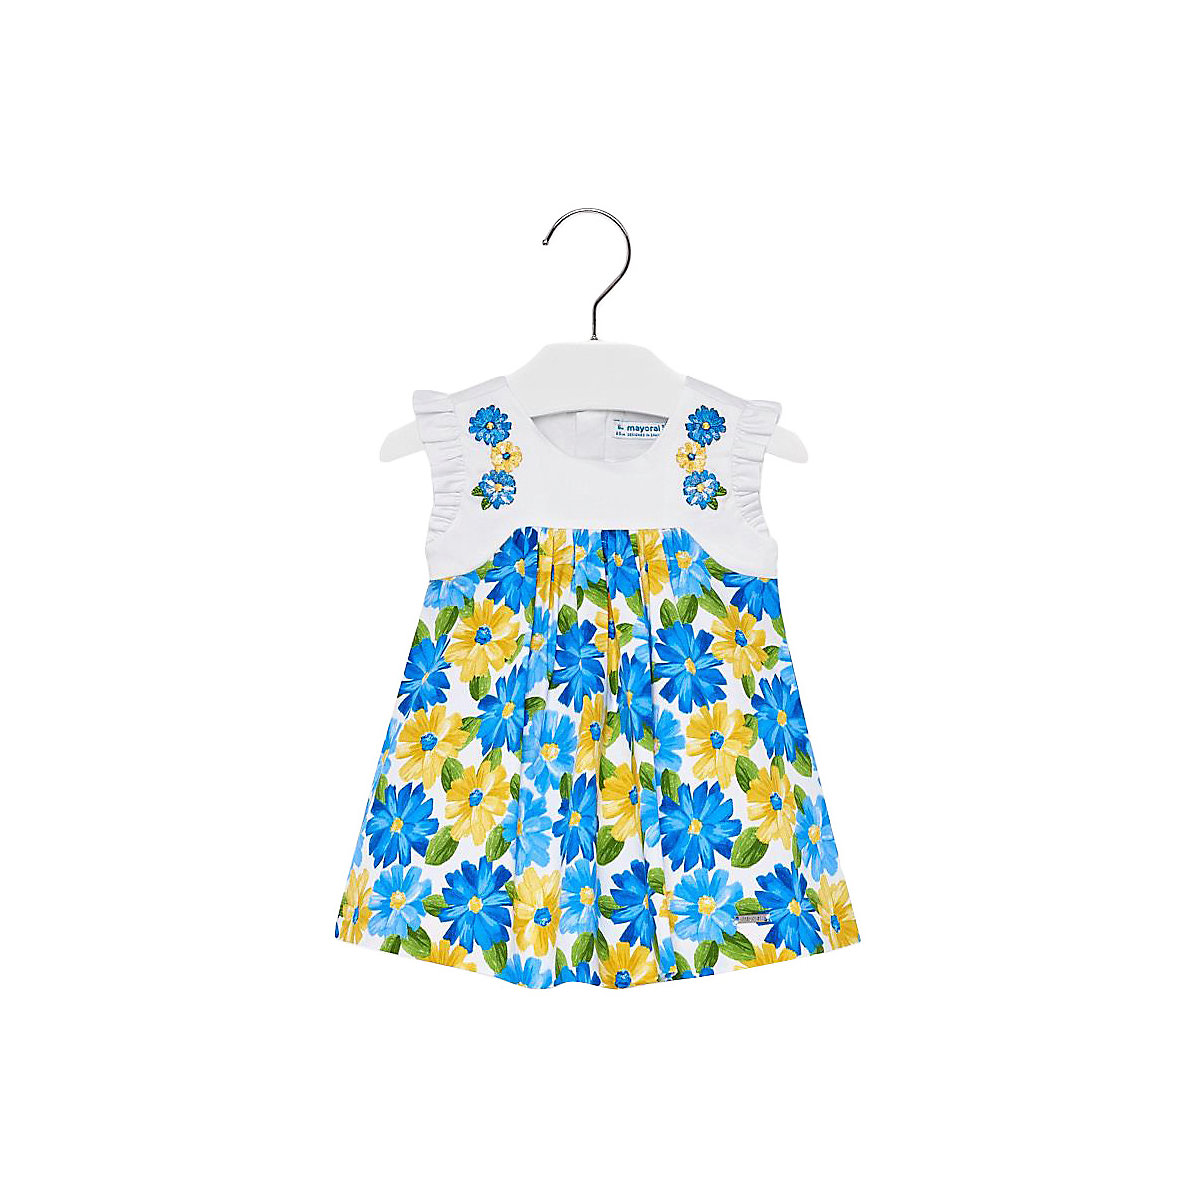 MAYORAL Dresses 10693298 dress for girls baby clothing fashion slim family long sleeve mesh dress for girls